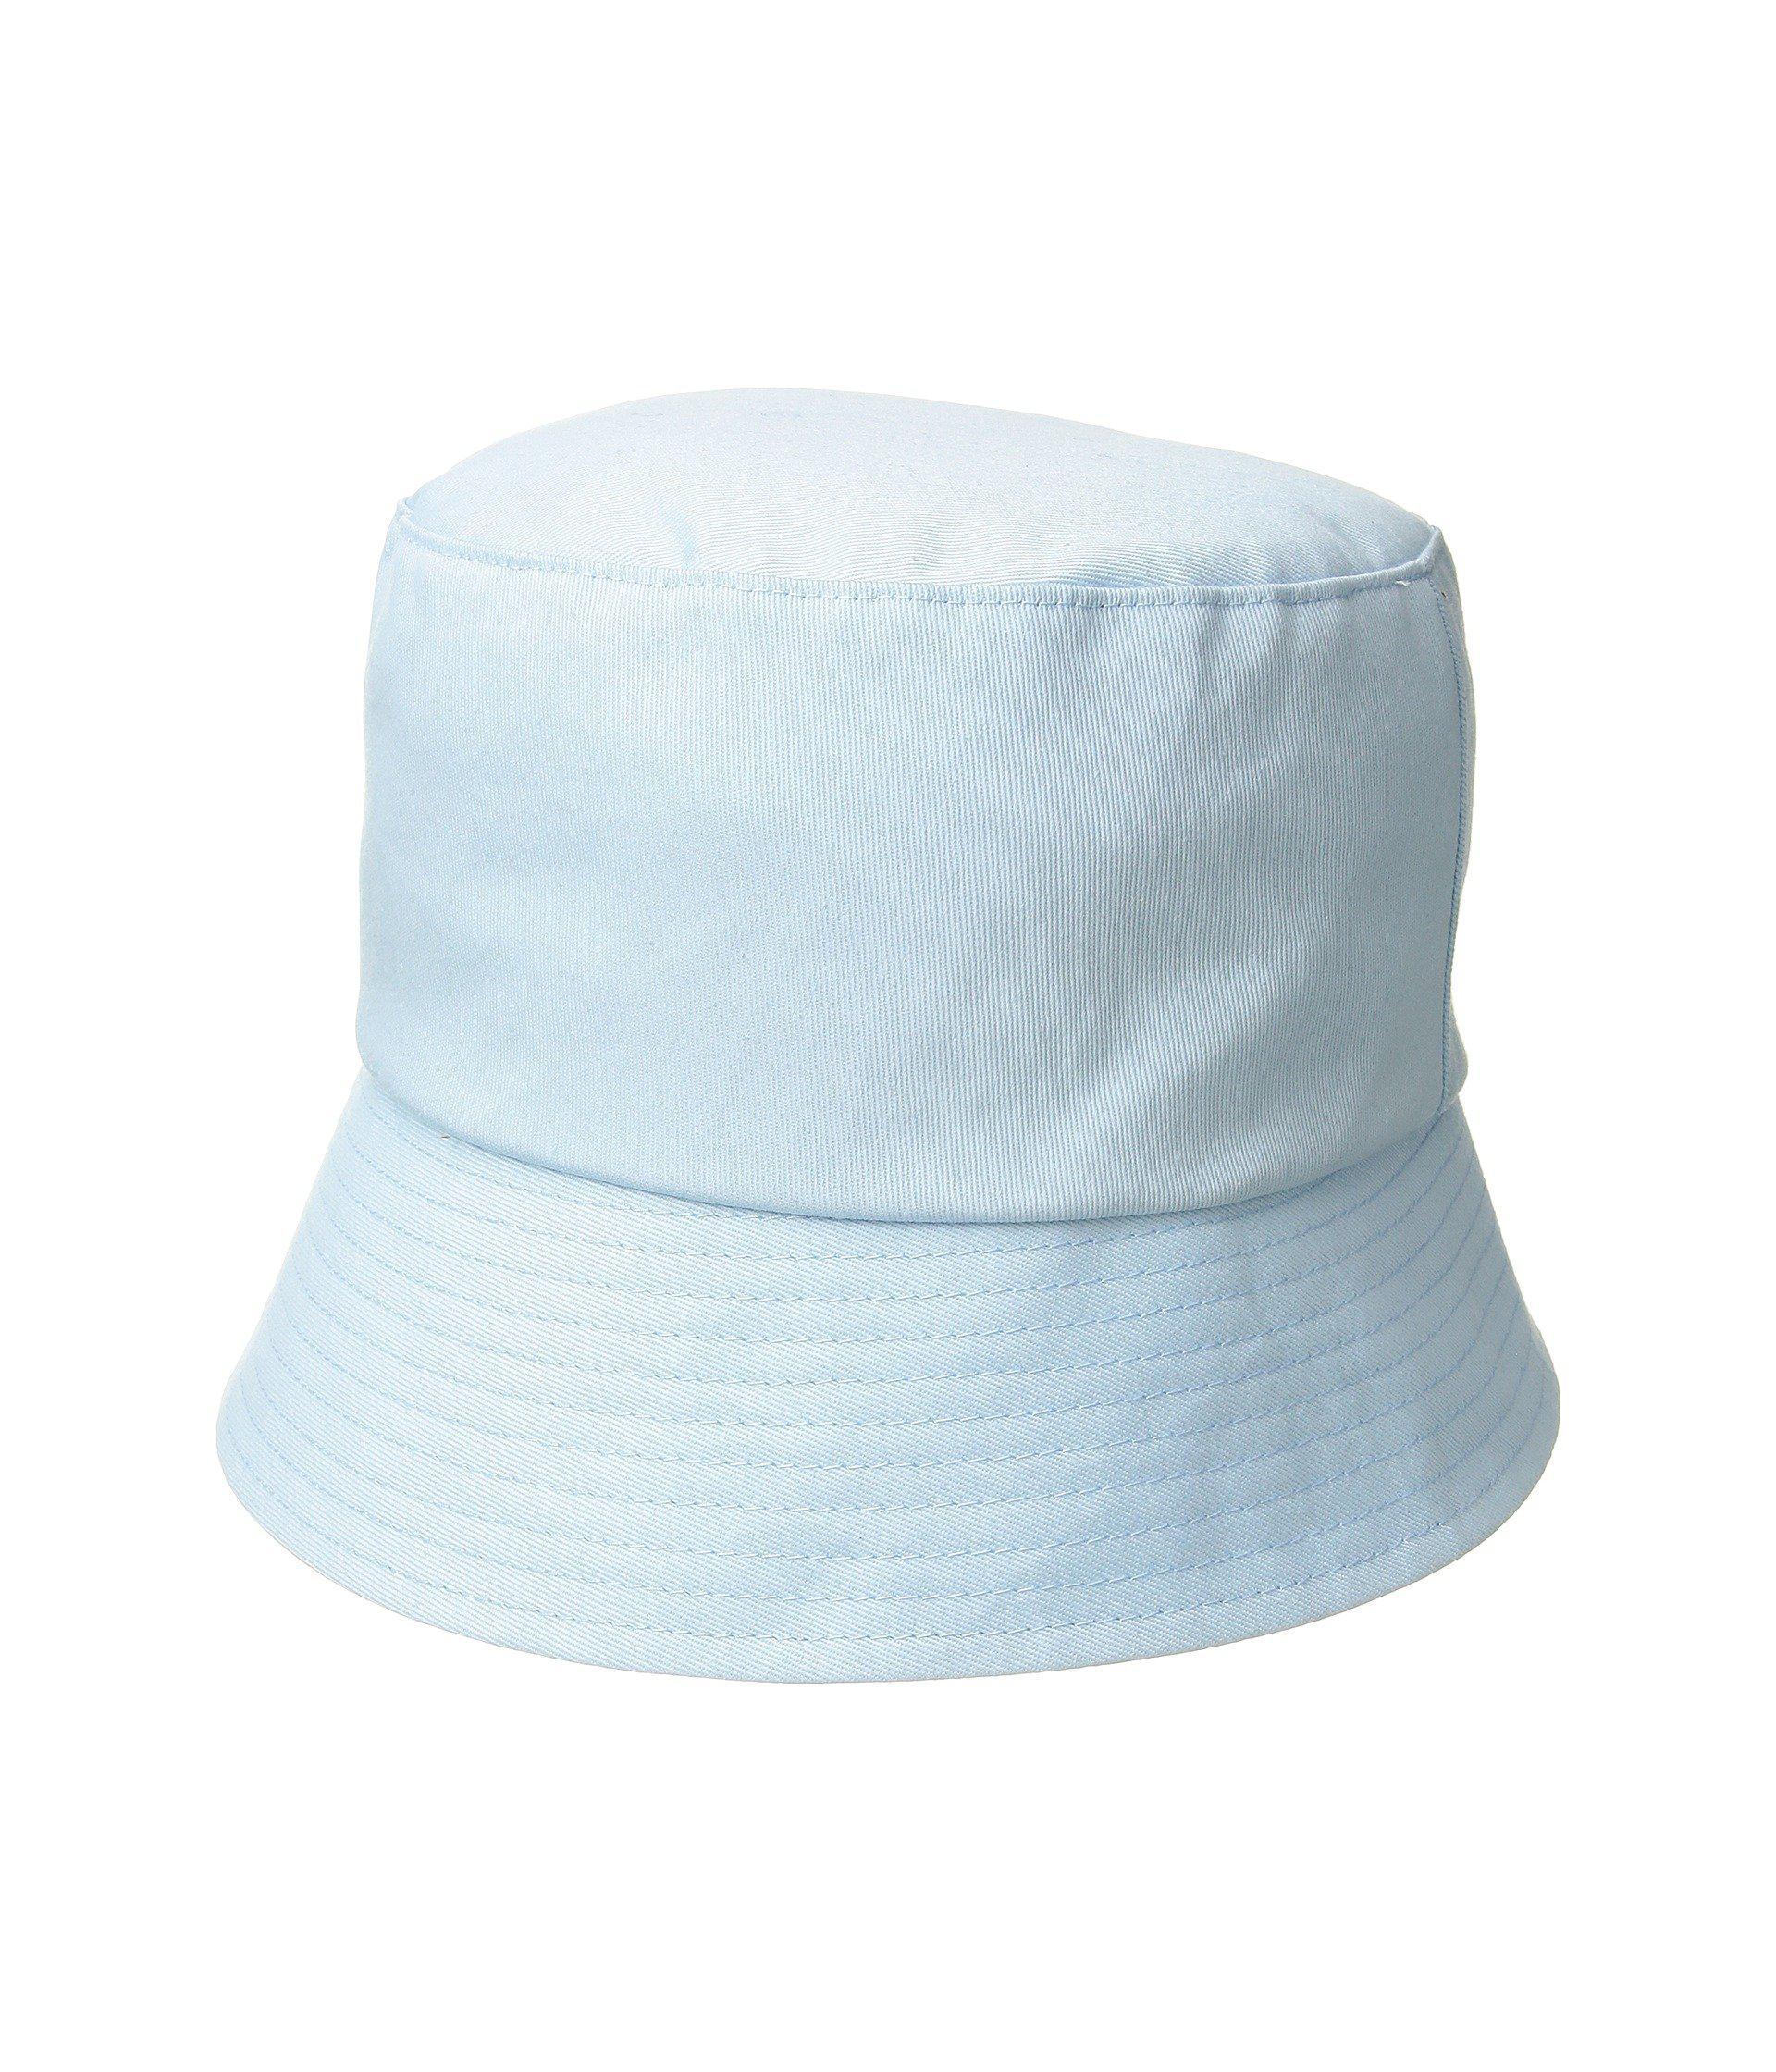 211c7ccf7ee Lyst - Betmar Gigi (light Blue) Caps in Blue